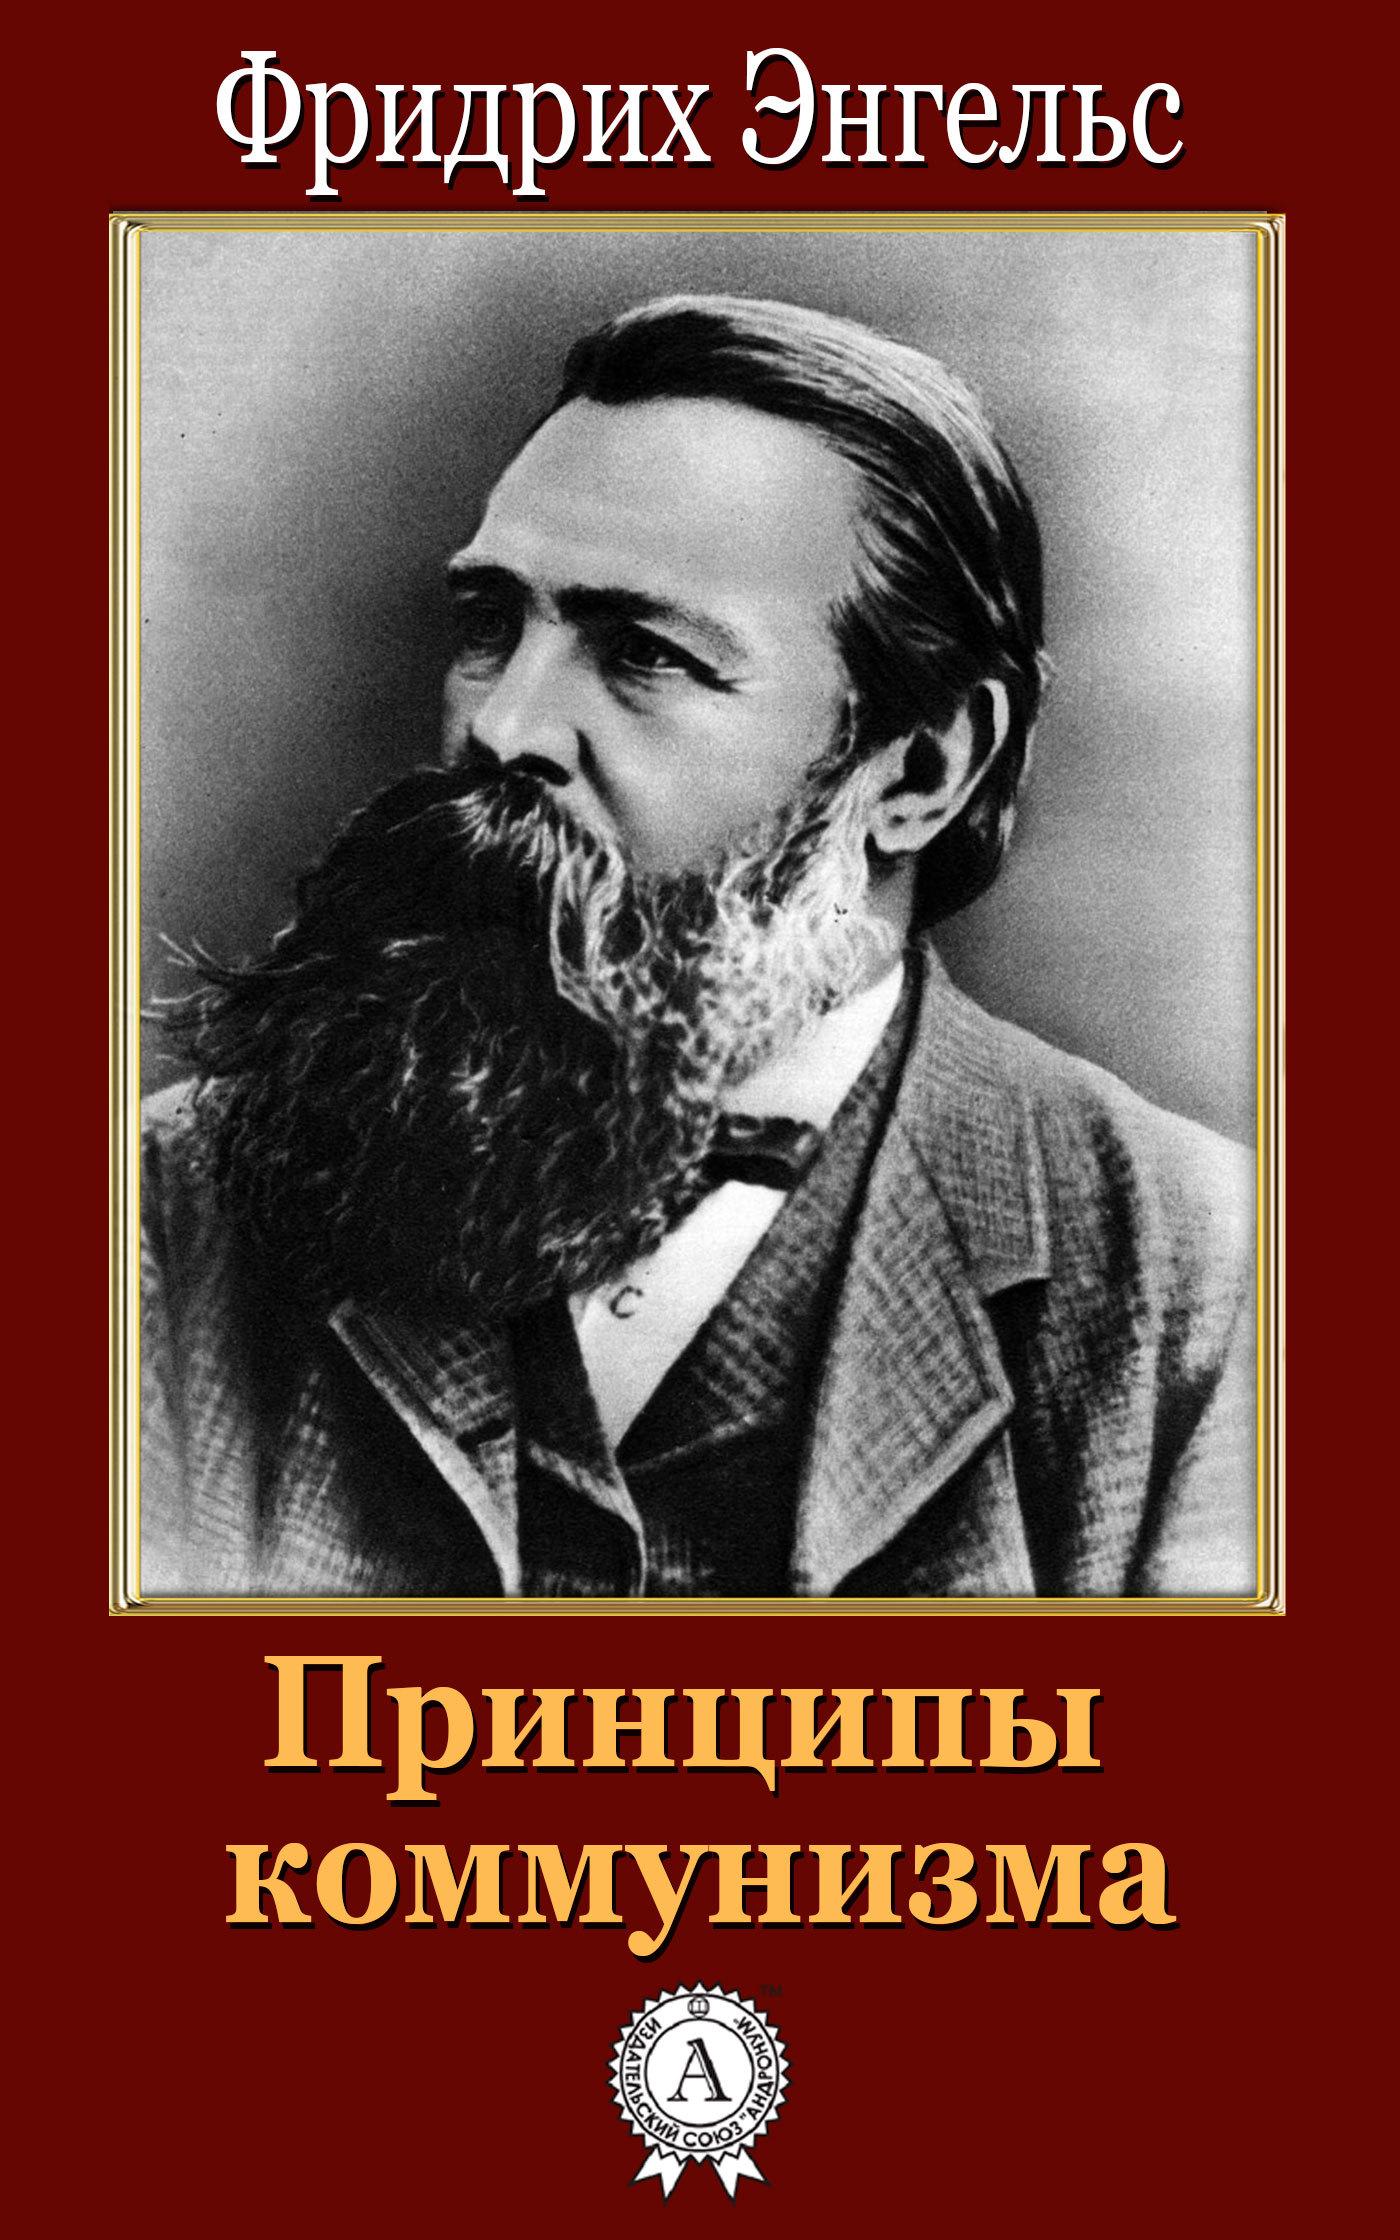 Принципы коммунизма